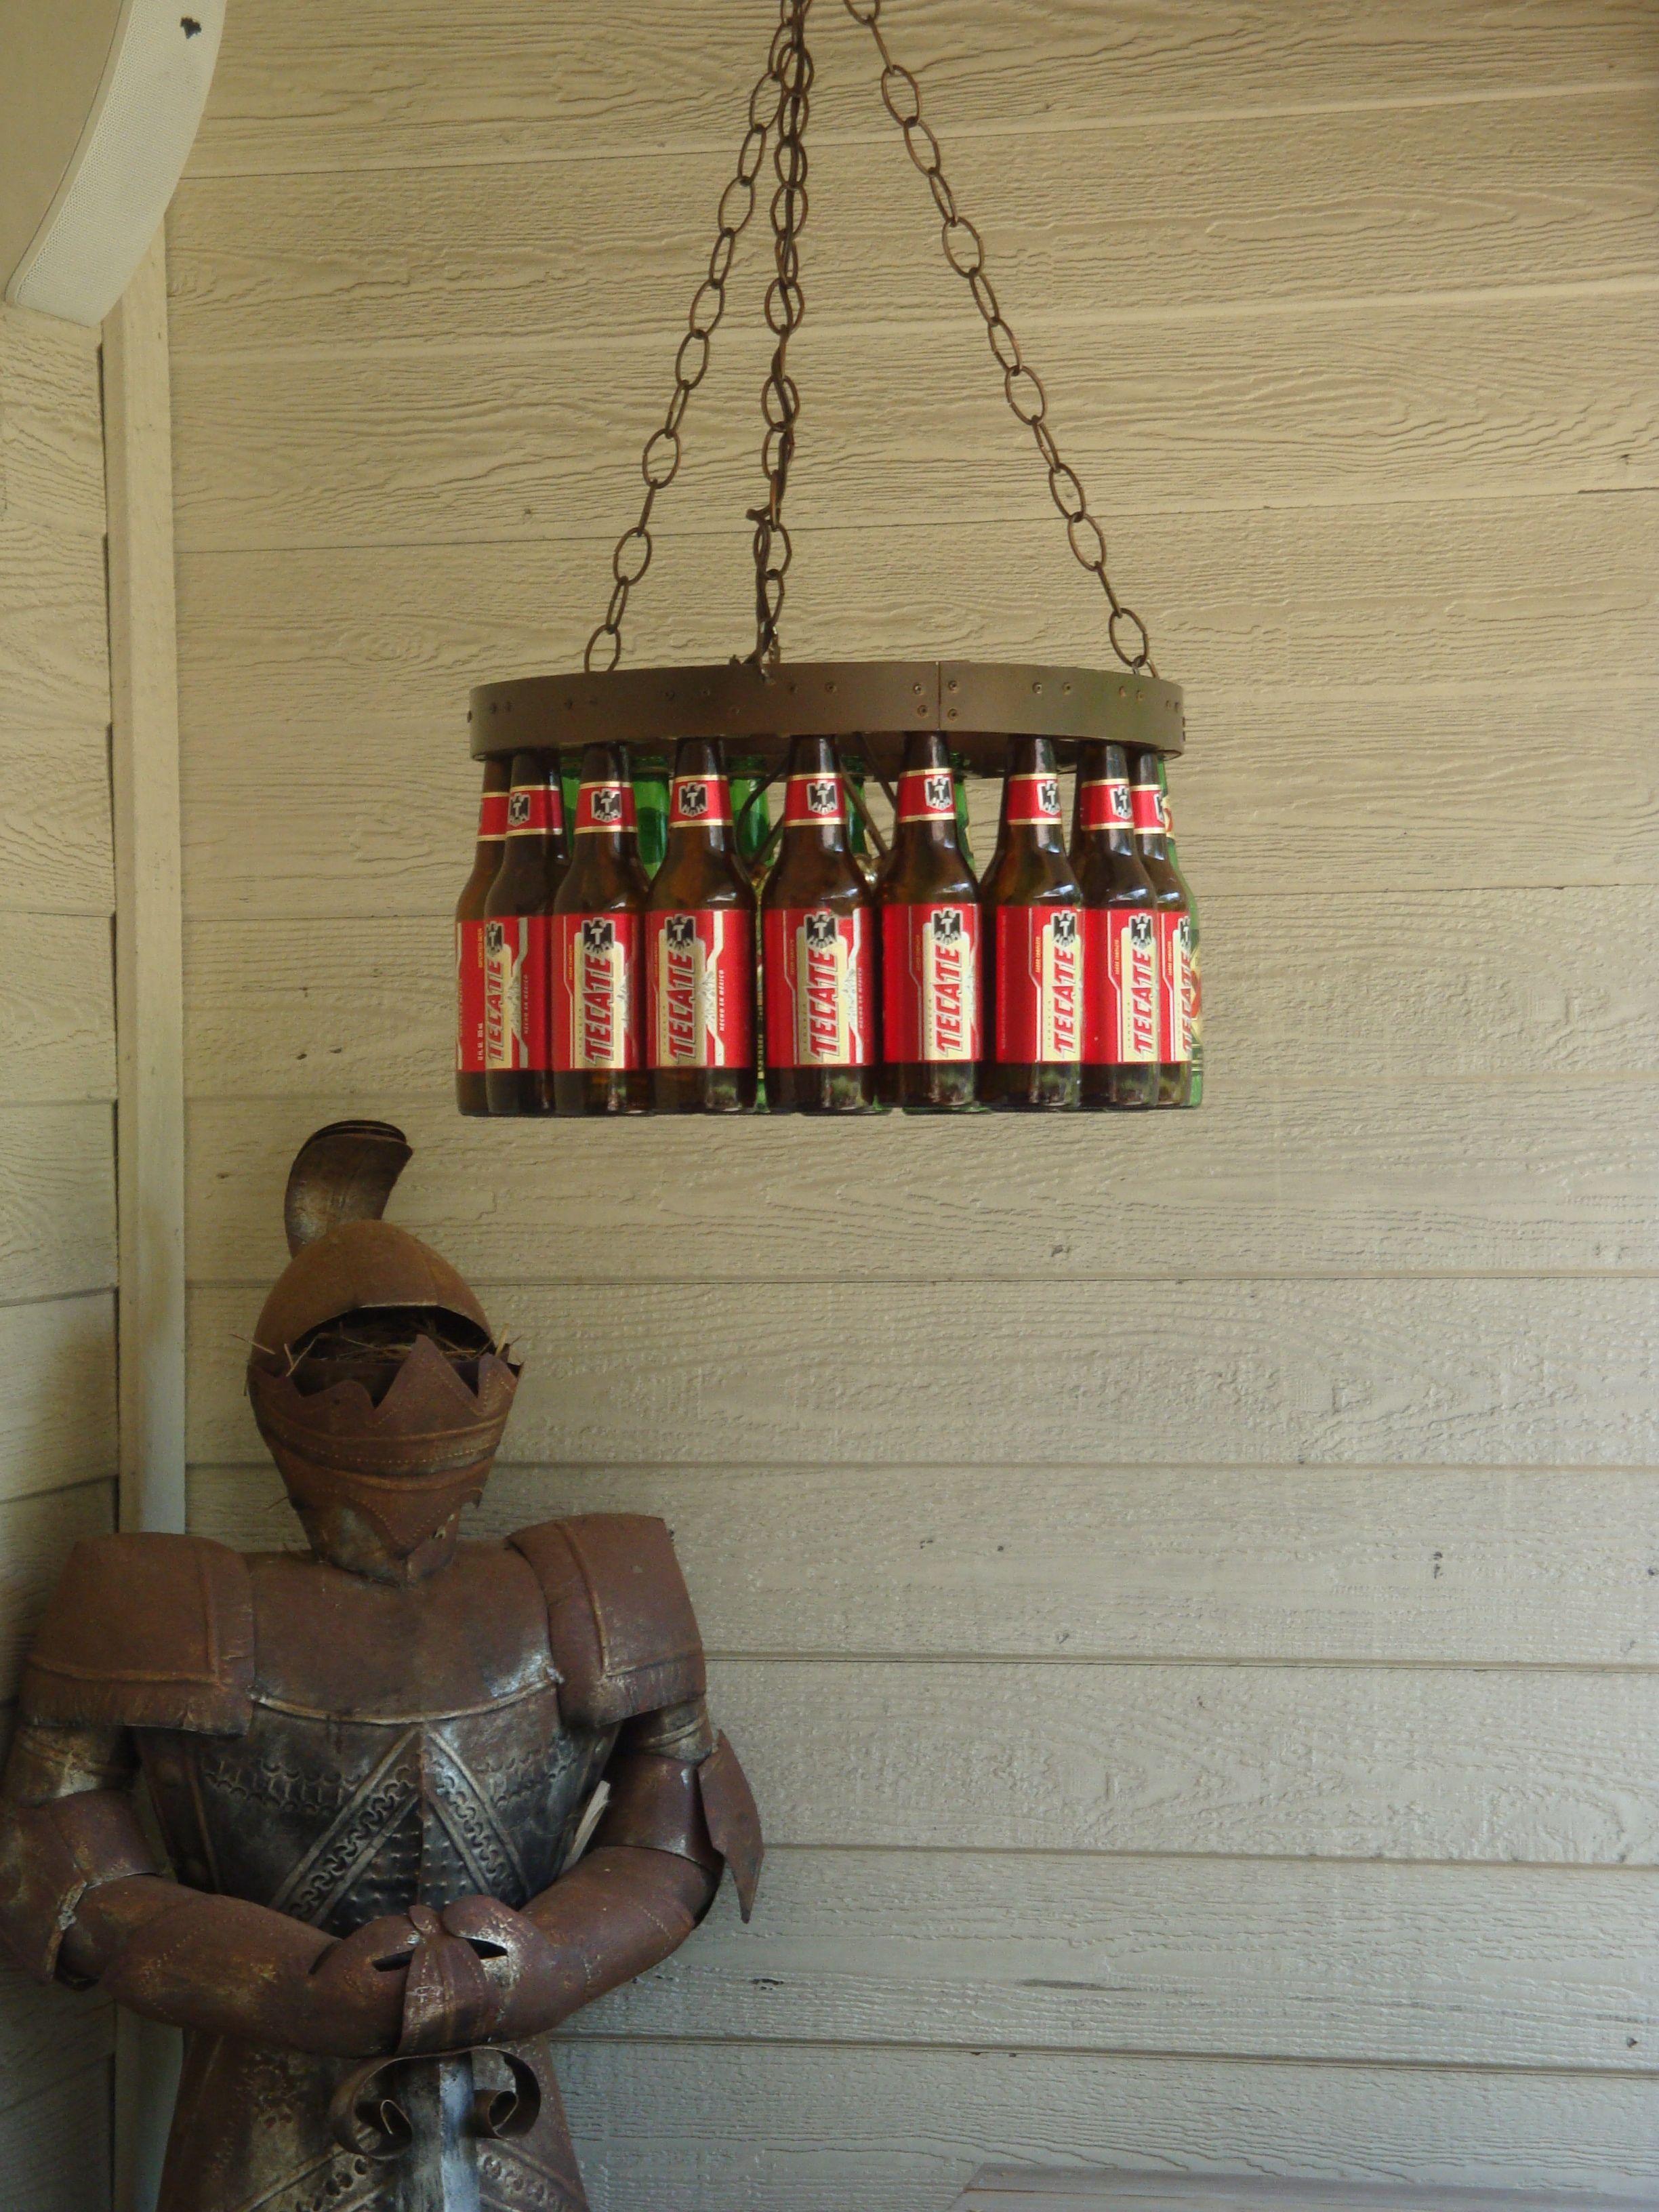 Beer Bottle Chandelier Kit 135.00 Bottle chandelier